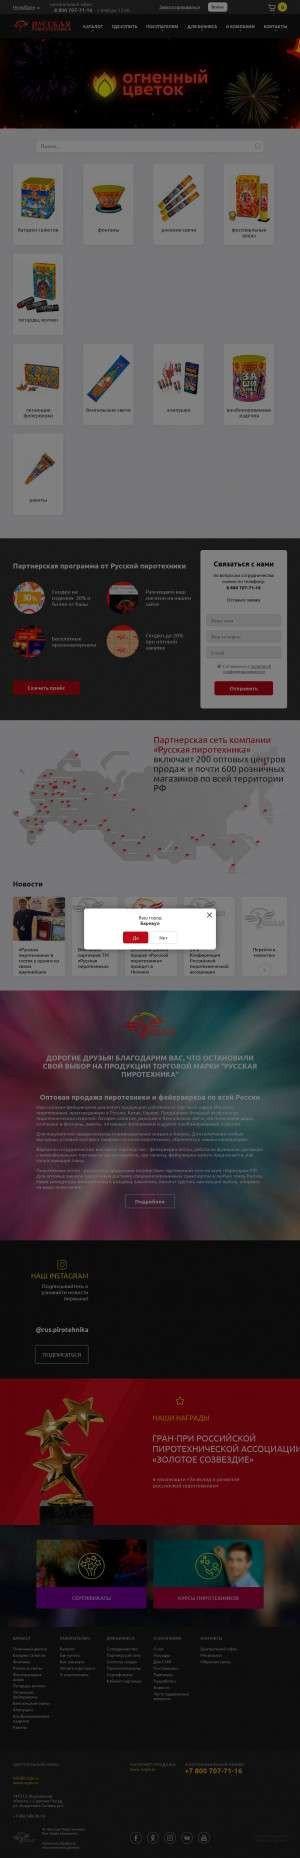 Предпросмотр для www.ruspir.ru — Русский фейерверк